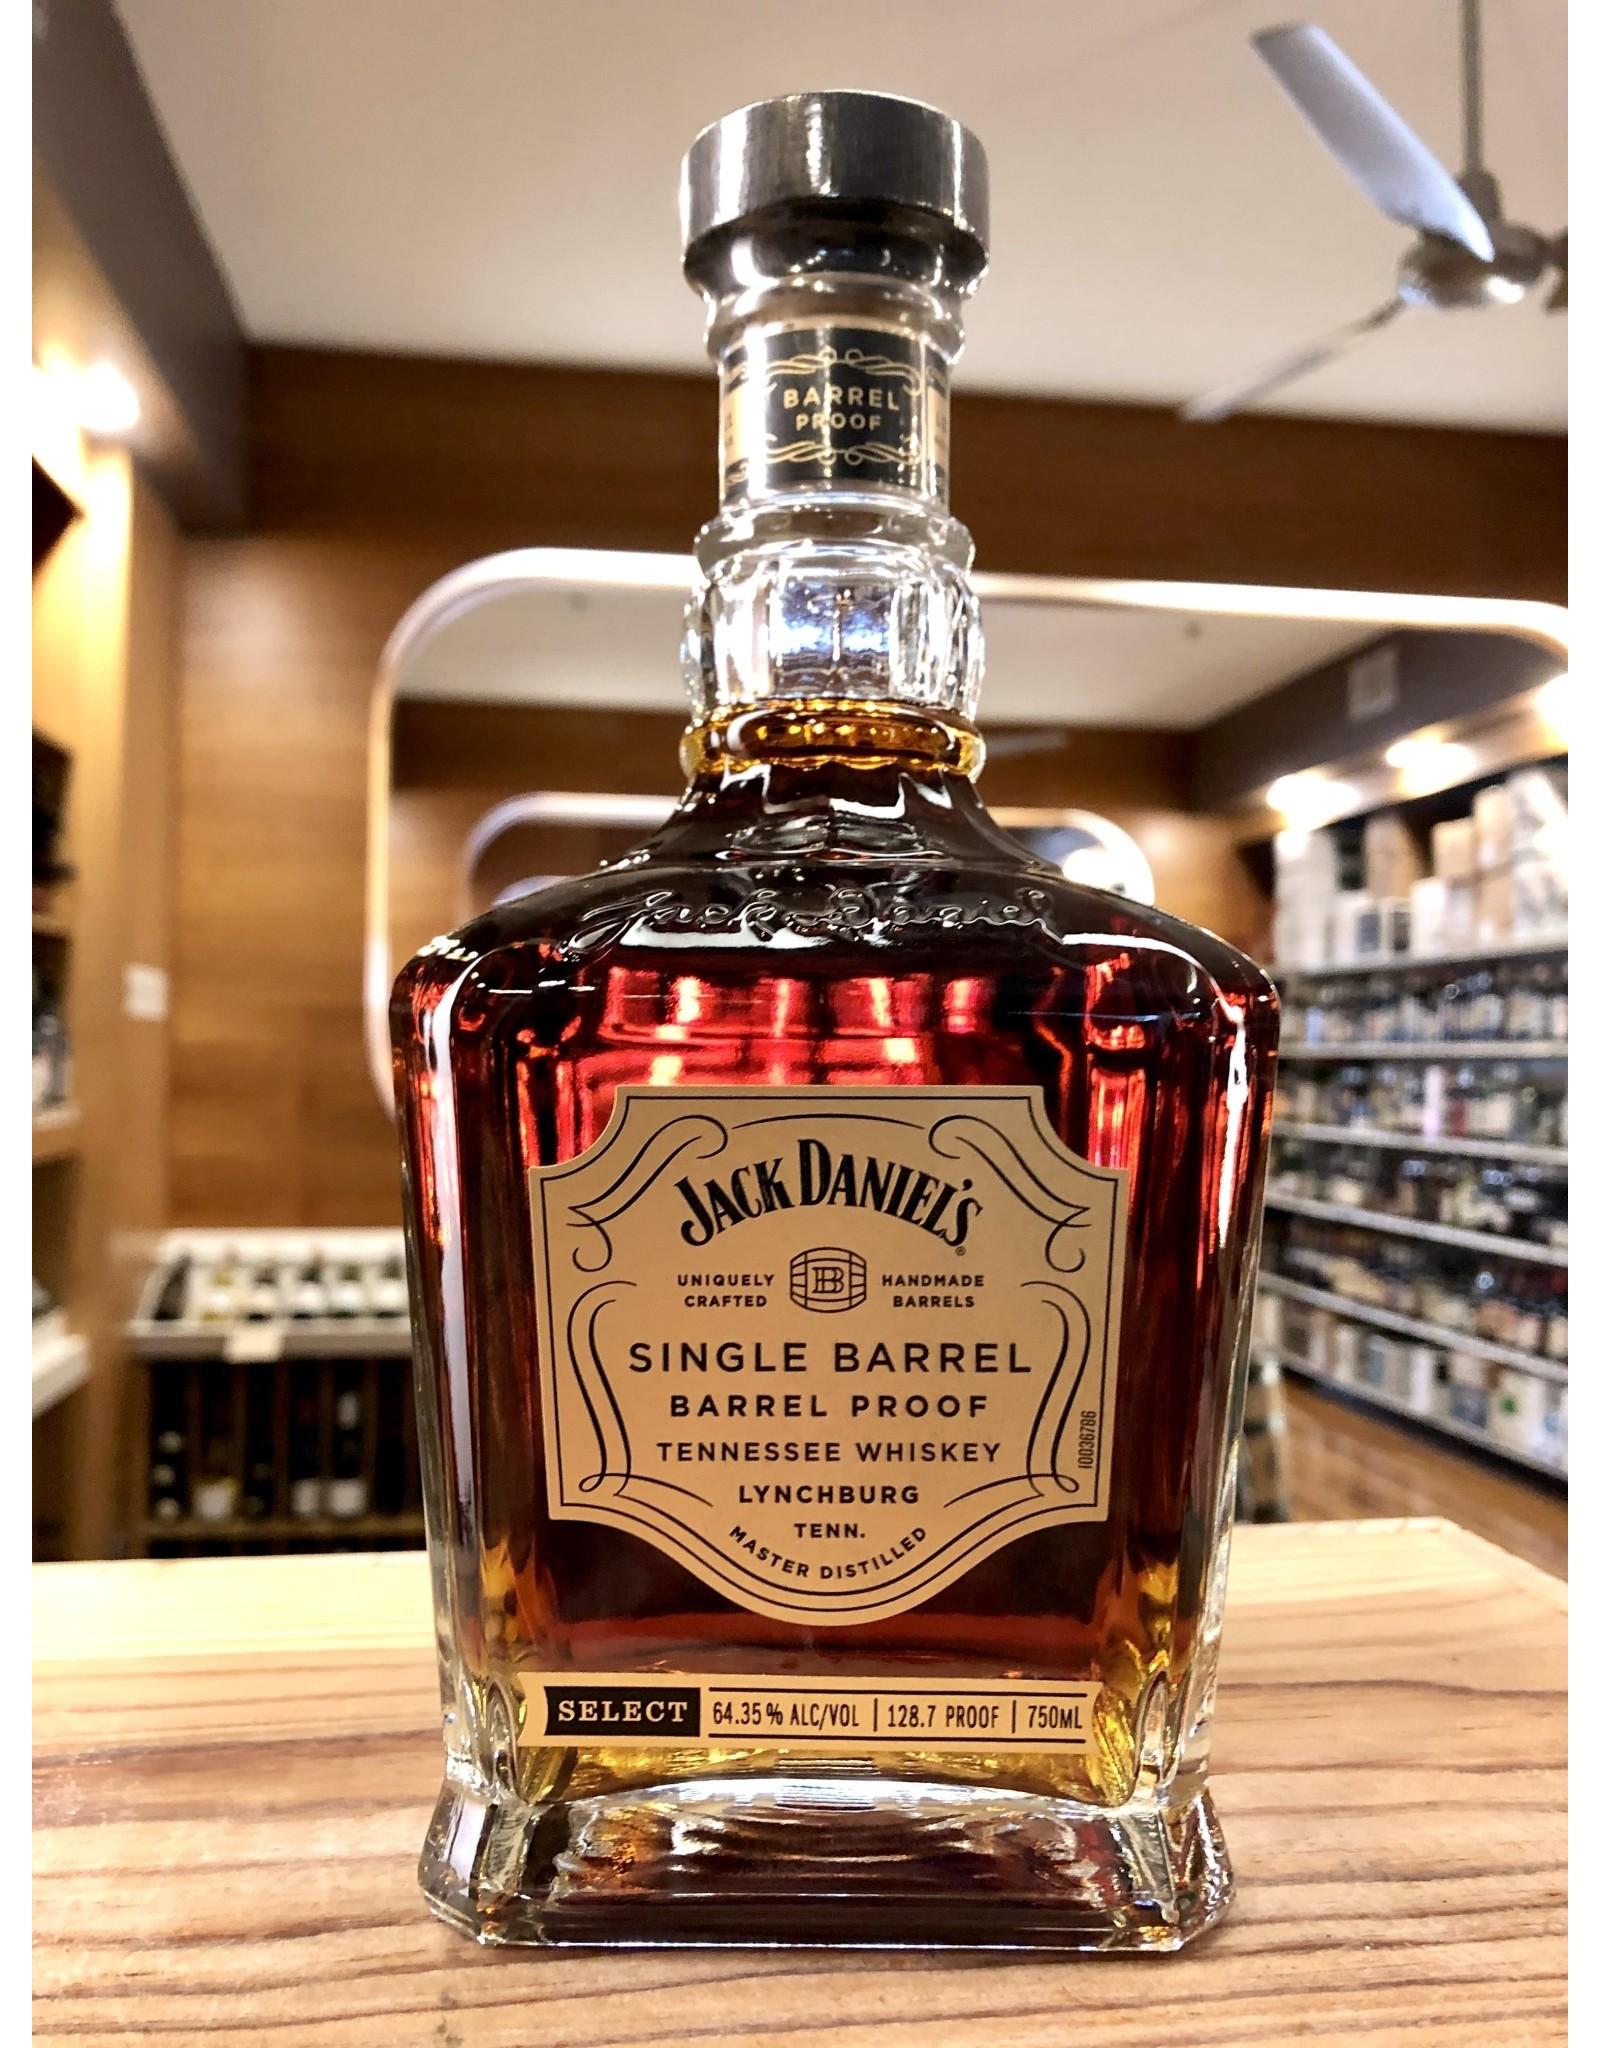 Jack Daniels Single Barrel Barrel Proof Whiskey - 750 ML